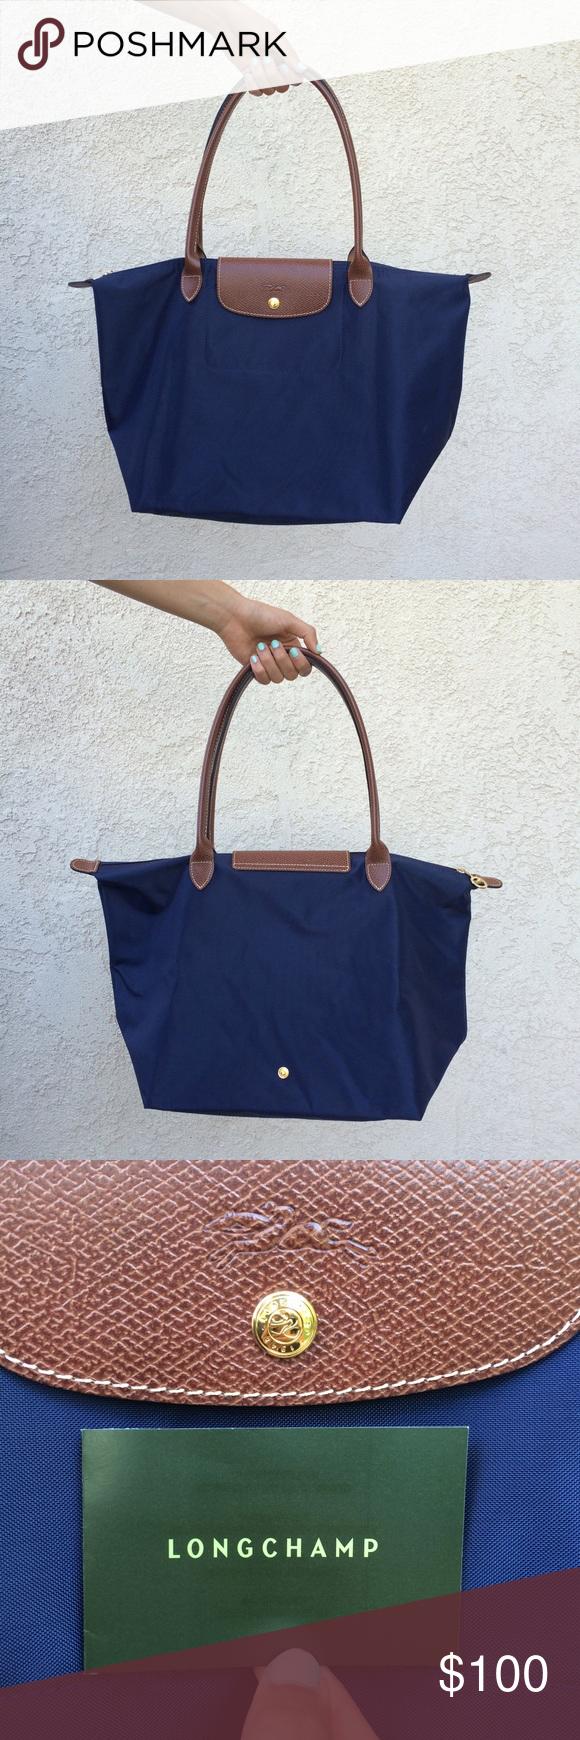 Ing This Longchamp Le Pliage Medium Handbag Navy Blue On Poshmark My Username Is Casualdetails